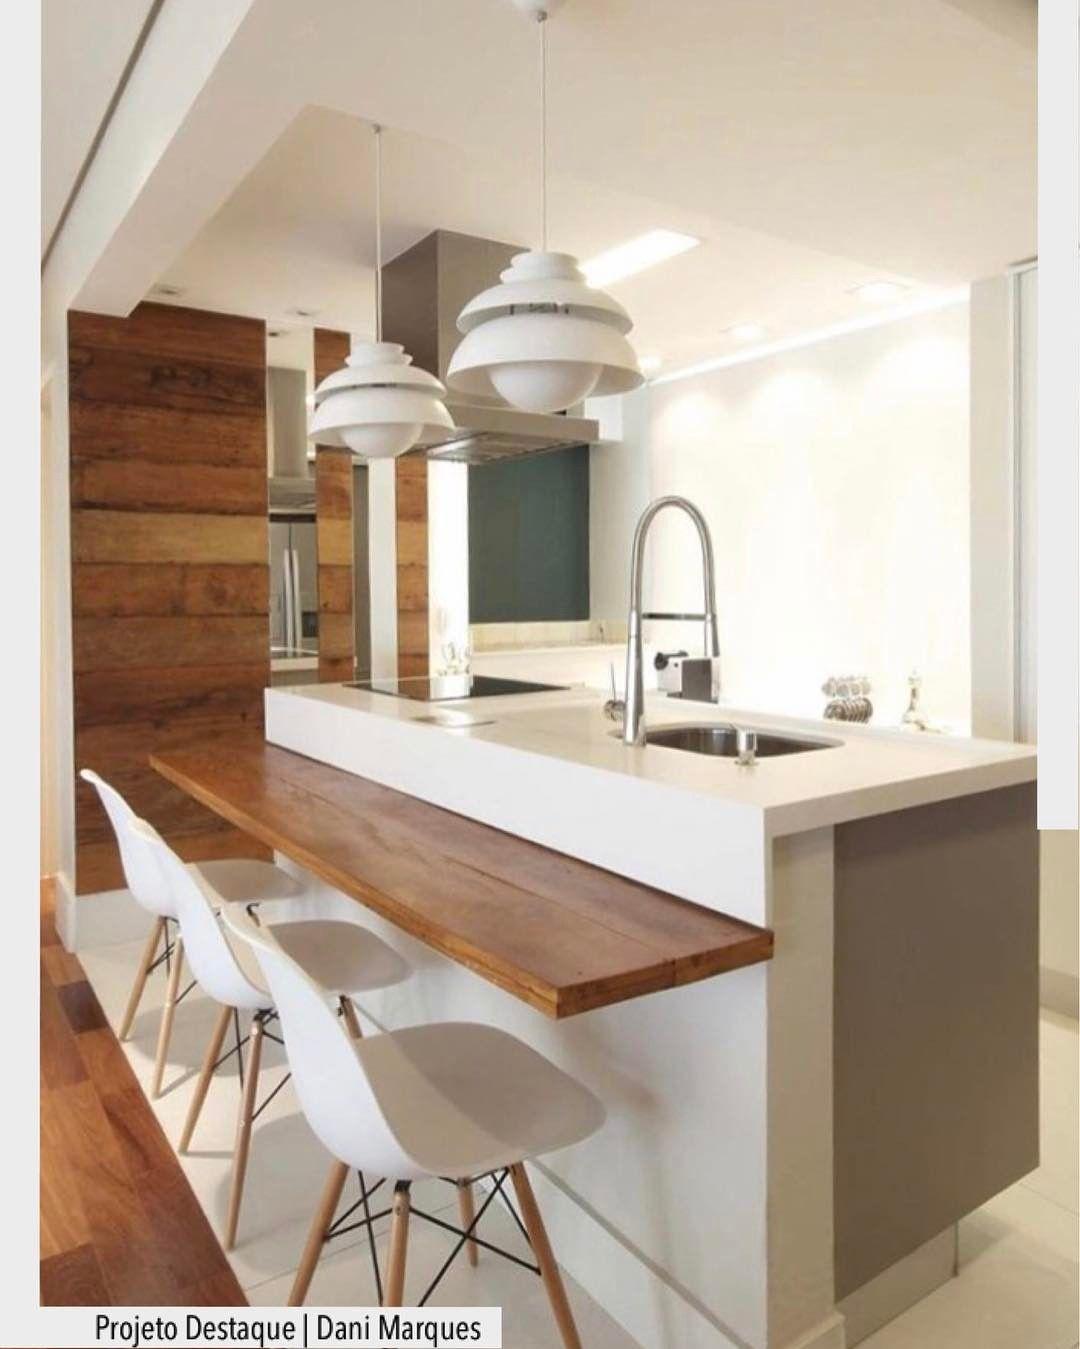 Cozinha Ilha Integrada Com A Sala Por Dani Marques Ad Http Ift